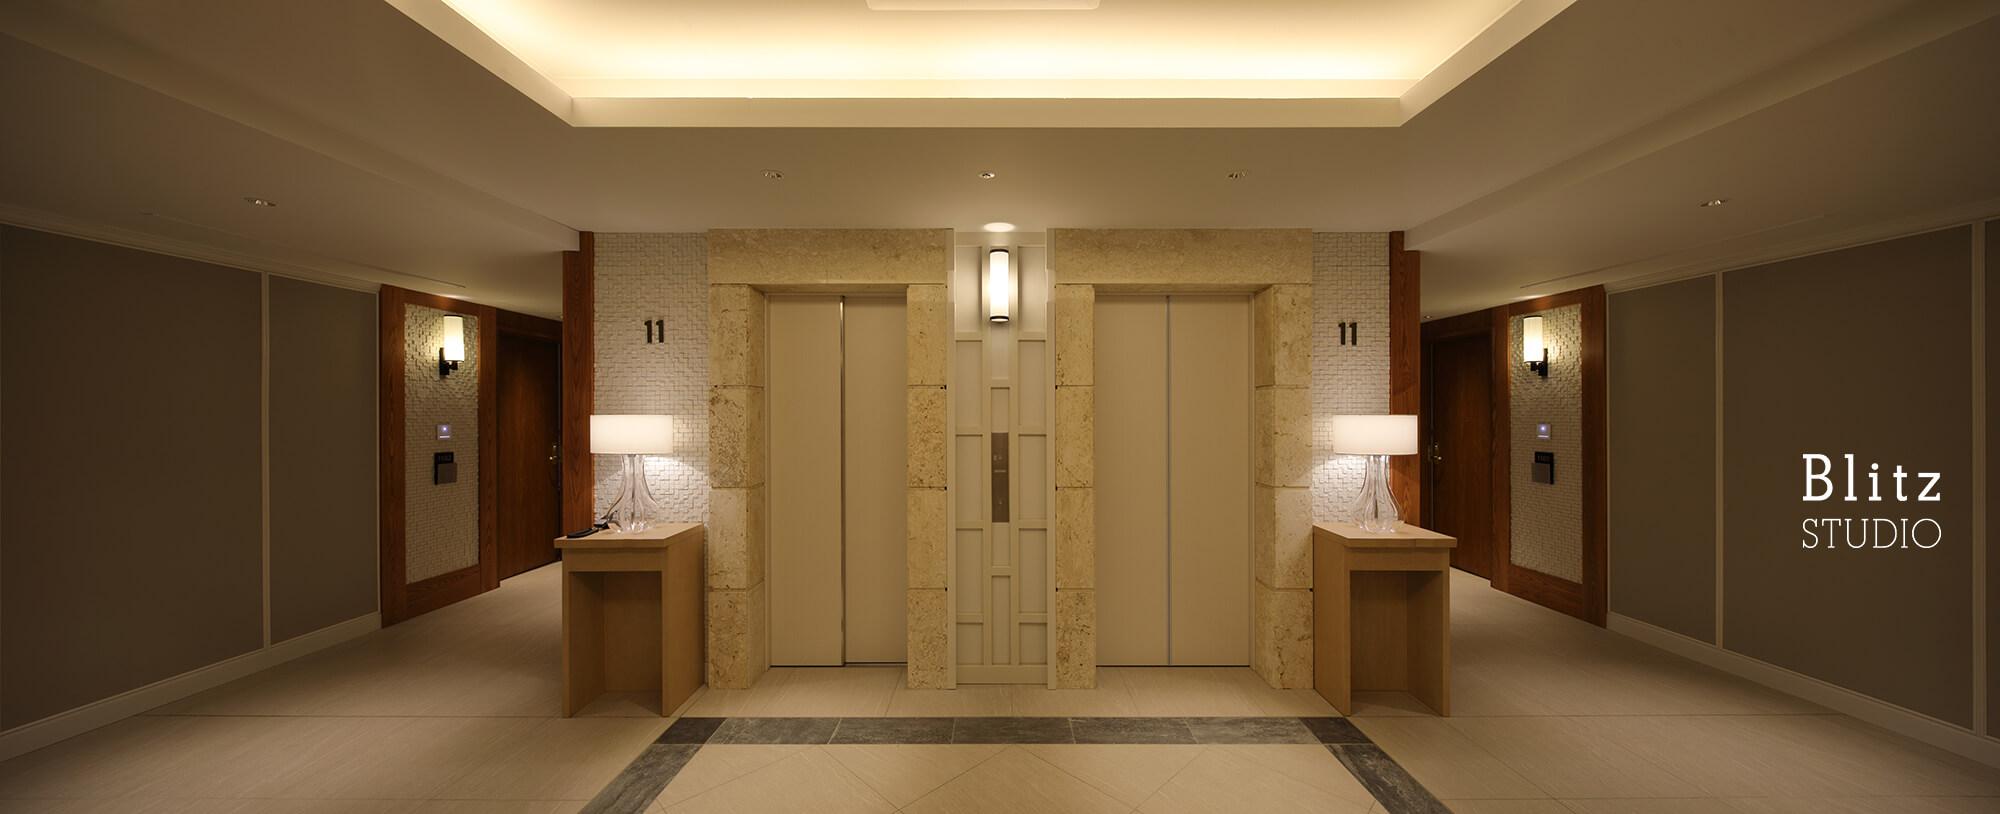 『HOTEL SHIGIRA MIRAGE BAYSIDE』建築写真・竣工写真・インテリア写真15